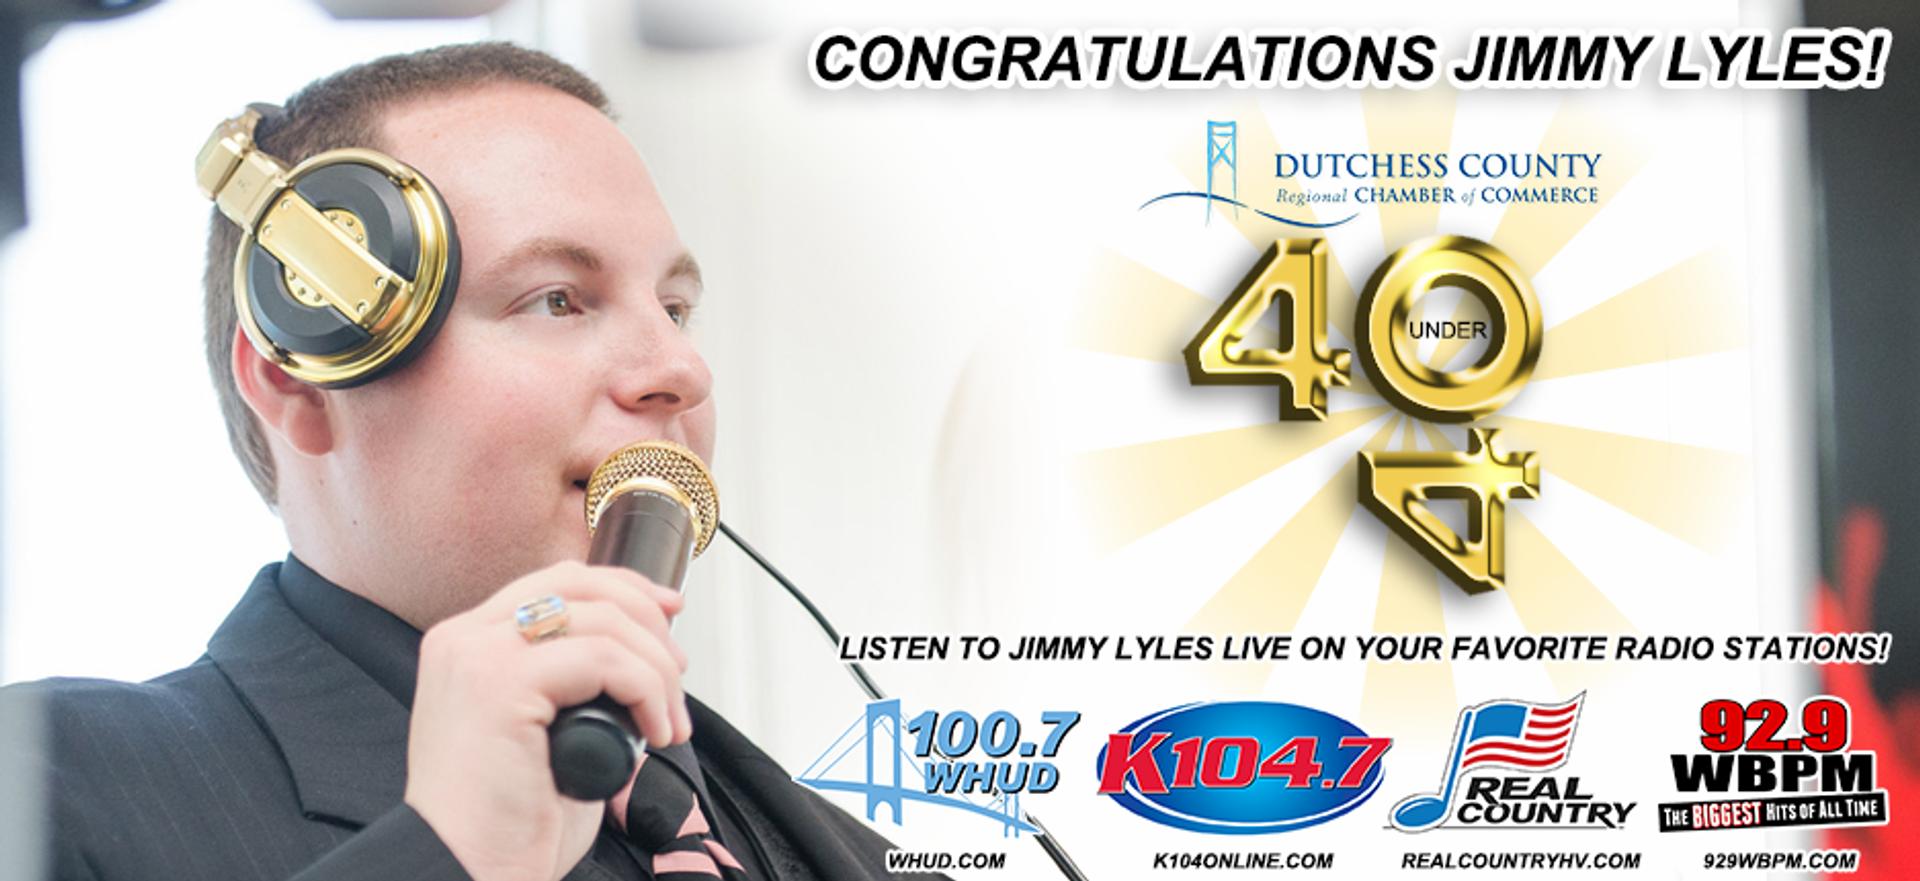 Jimmy Lyles 40 Under 40